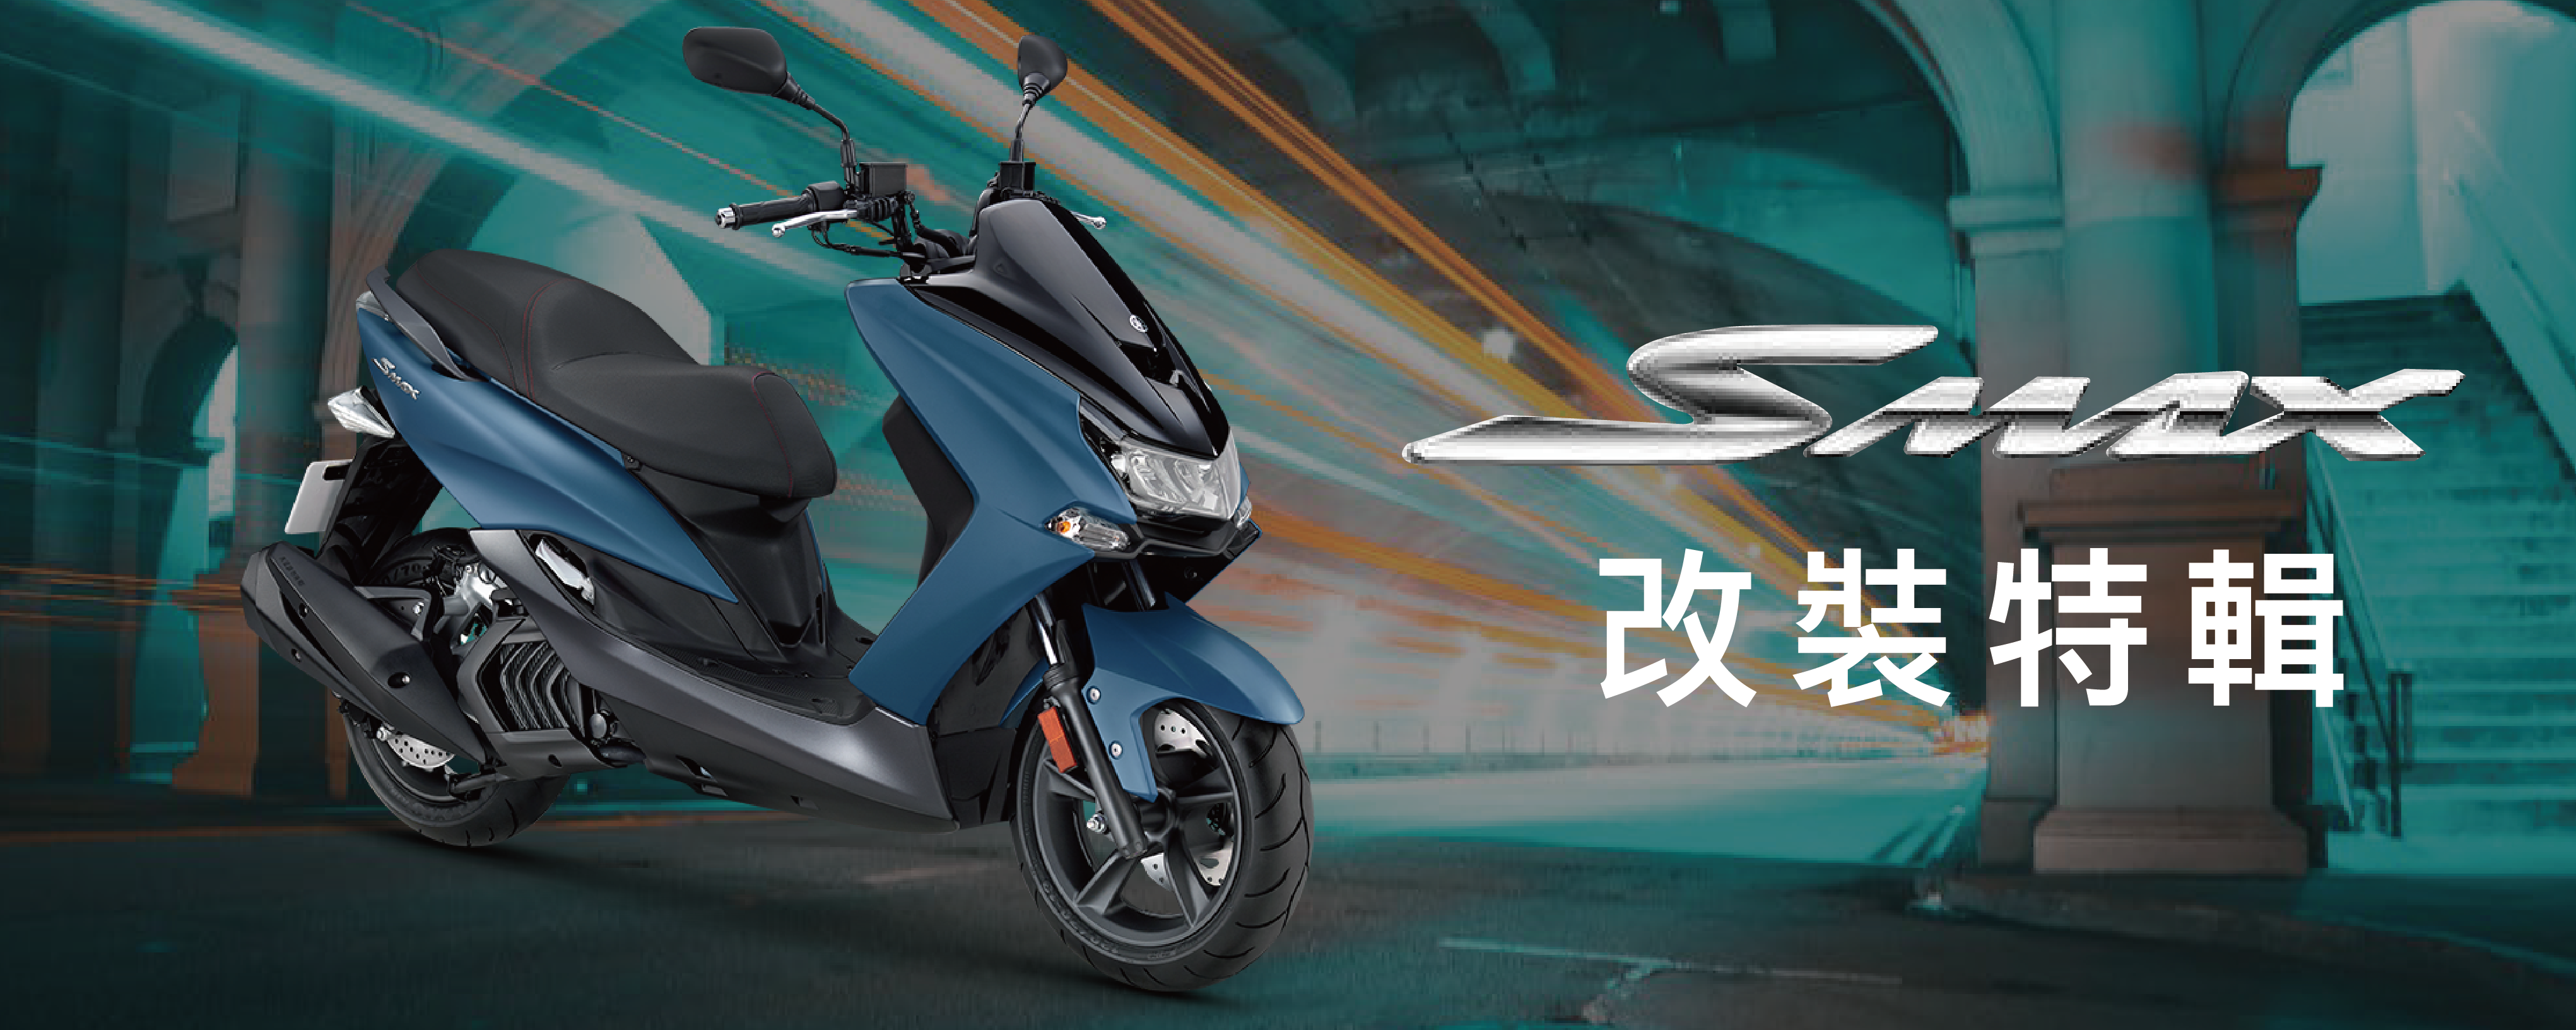 2017 SMAX 改裝特輯| 重機與機車零件、騎士服裝販售 Webike摩托百貨